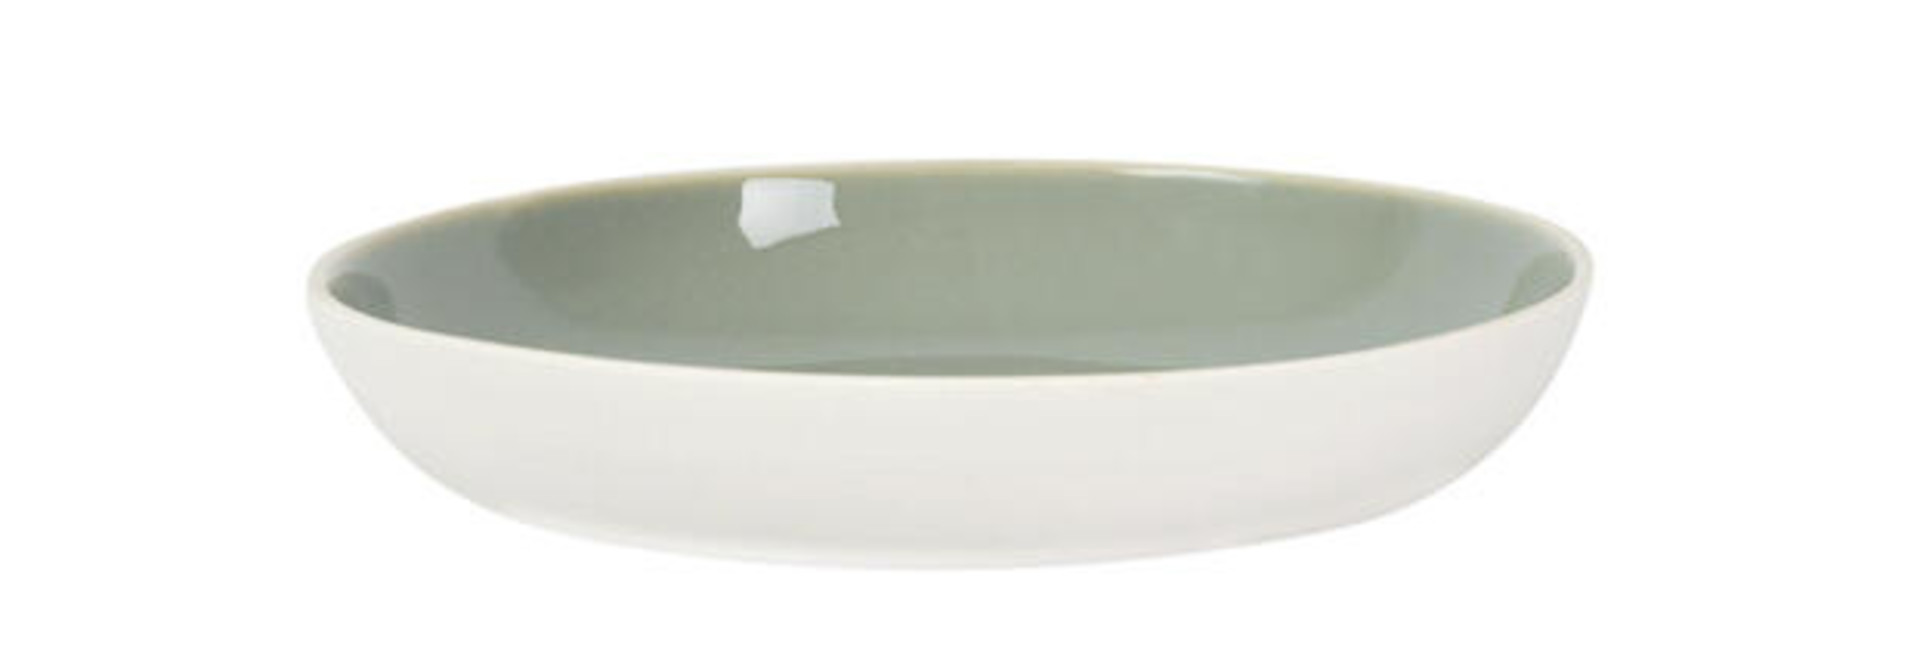 Pasta Plate - Studio - Lt. Grey